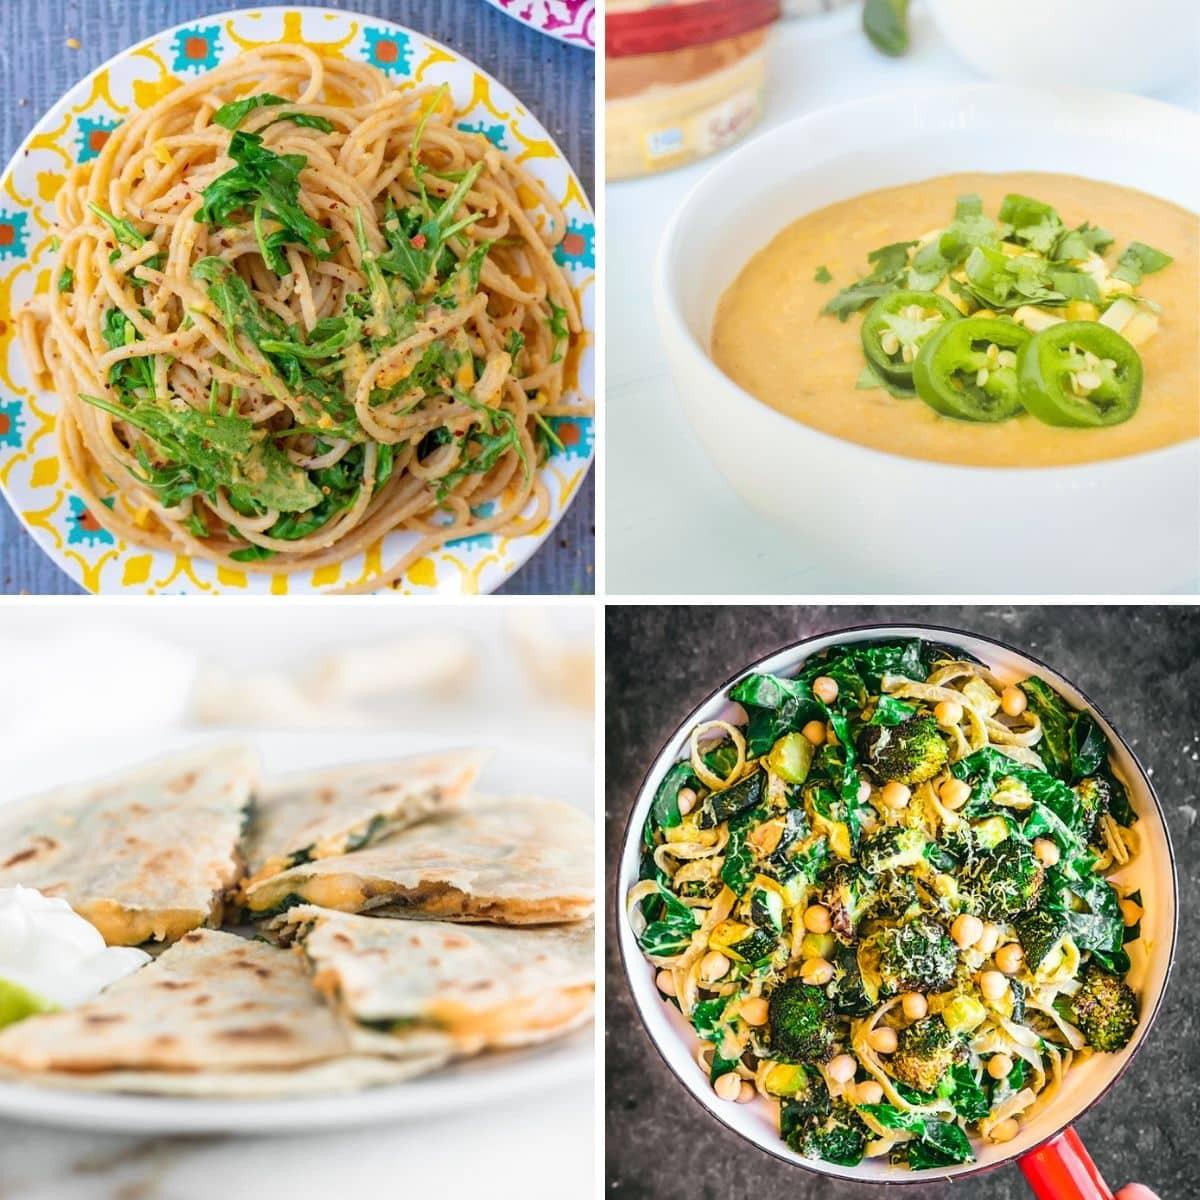 4 images 4 food: Creamy Butternut Squash Hummus Pasta, Jalapeno Hummus Corn Chowder, Spinach Mushroom Hummus Quesadilla, Creamy Hummus and Greens Pasta